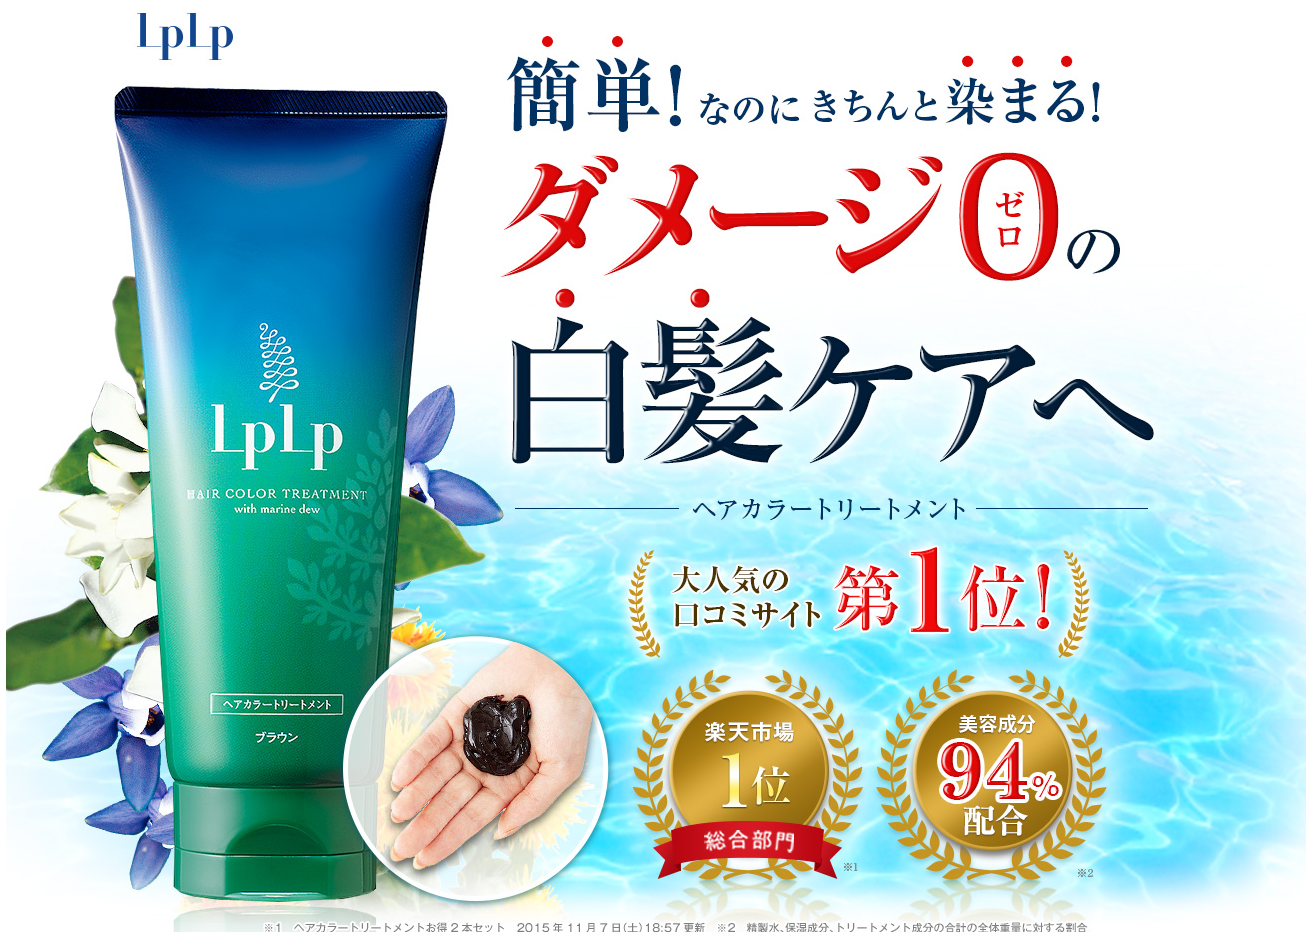 LPLP(ルプルプ)で白髪を染める効果を倍以上にする方法をご紹介!